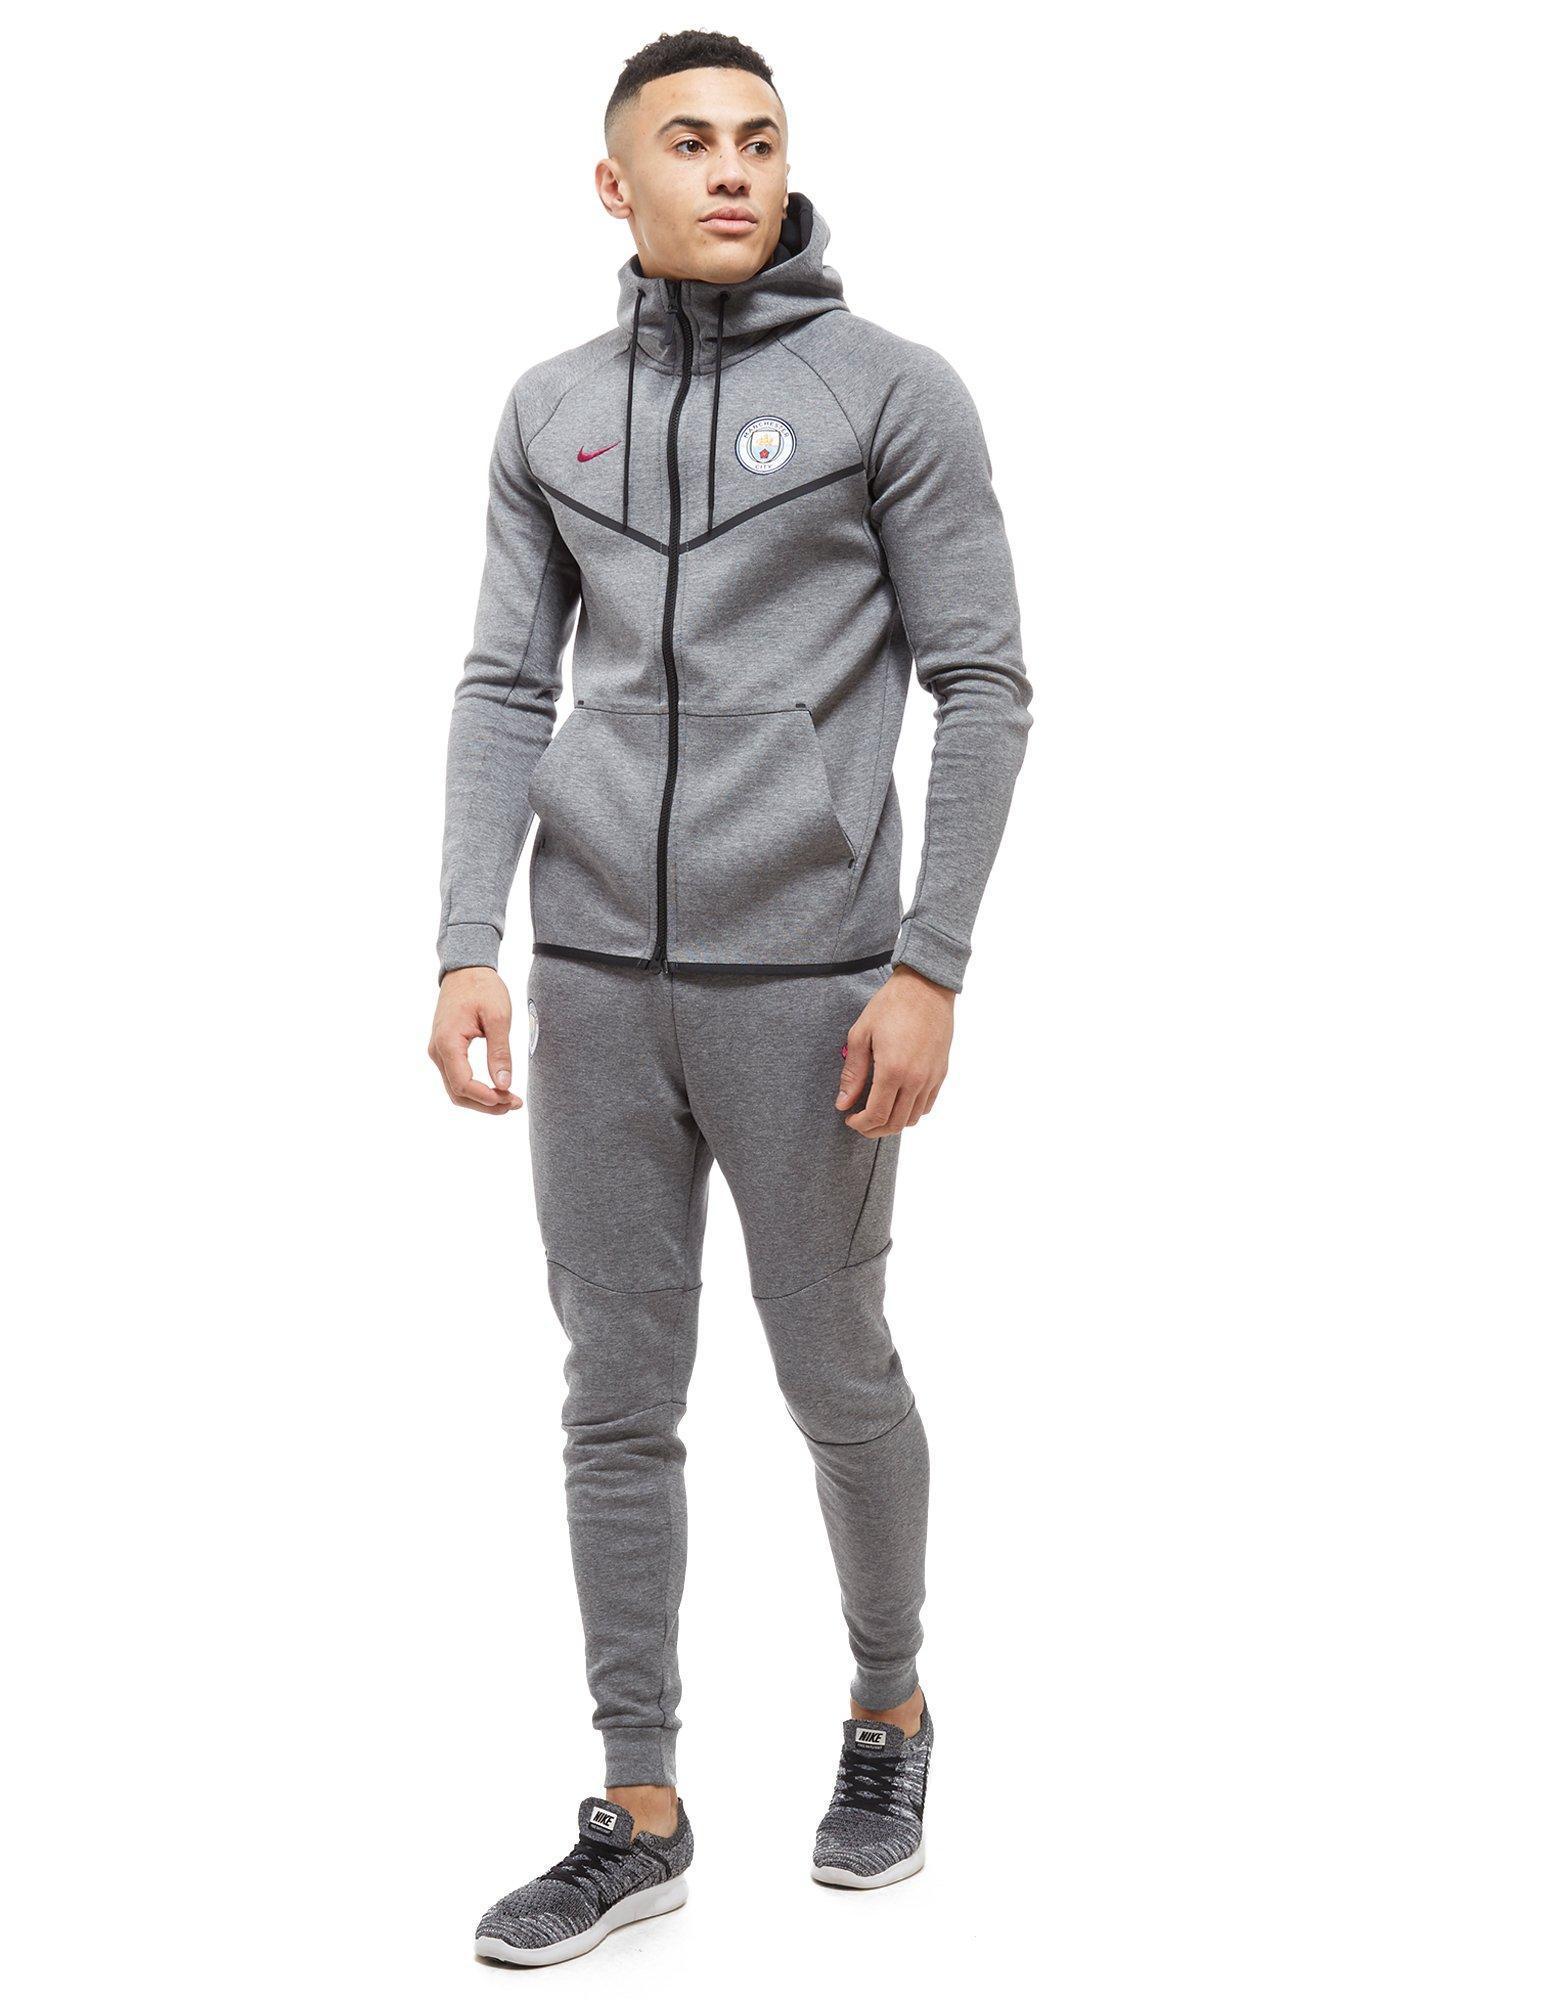 Lyst - Nike Manchester City Fc Tech Fleece Hoodie in Gray for Men a0b2b416303d